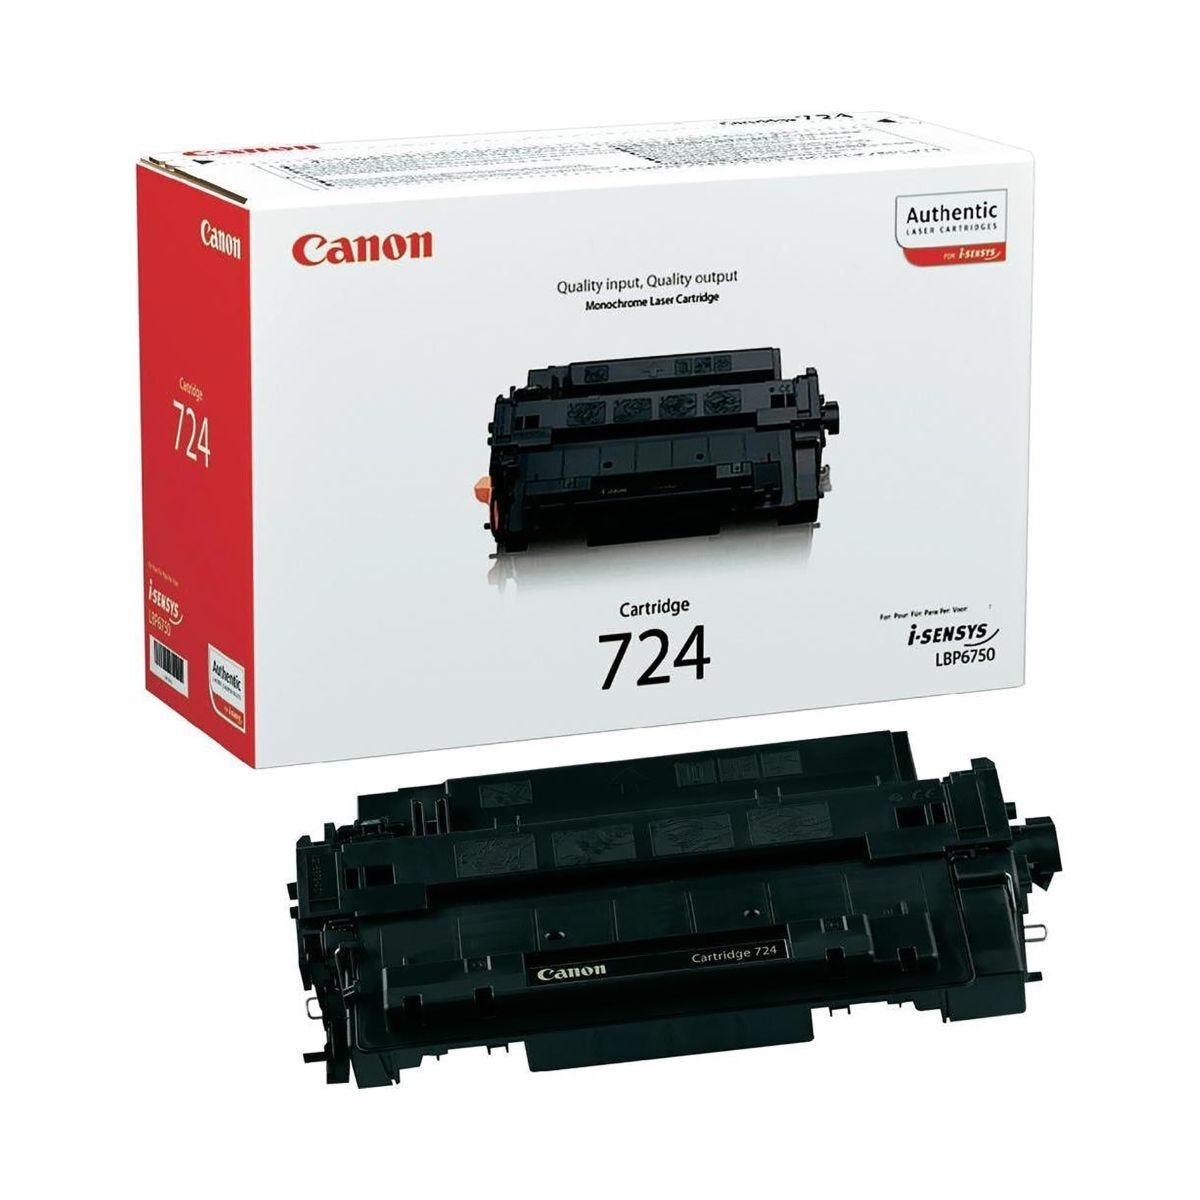 Canon LBP6750DN Black Toner